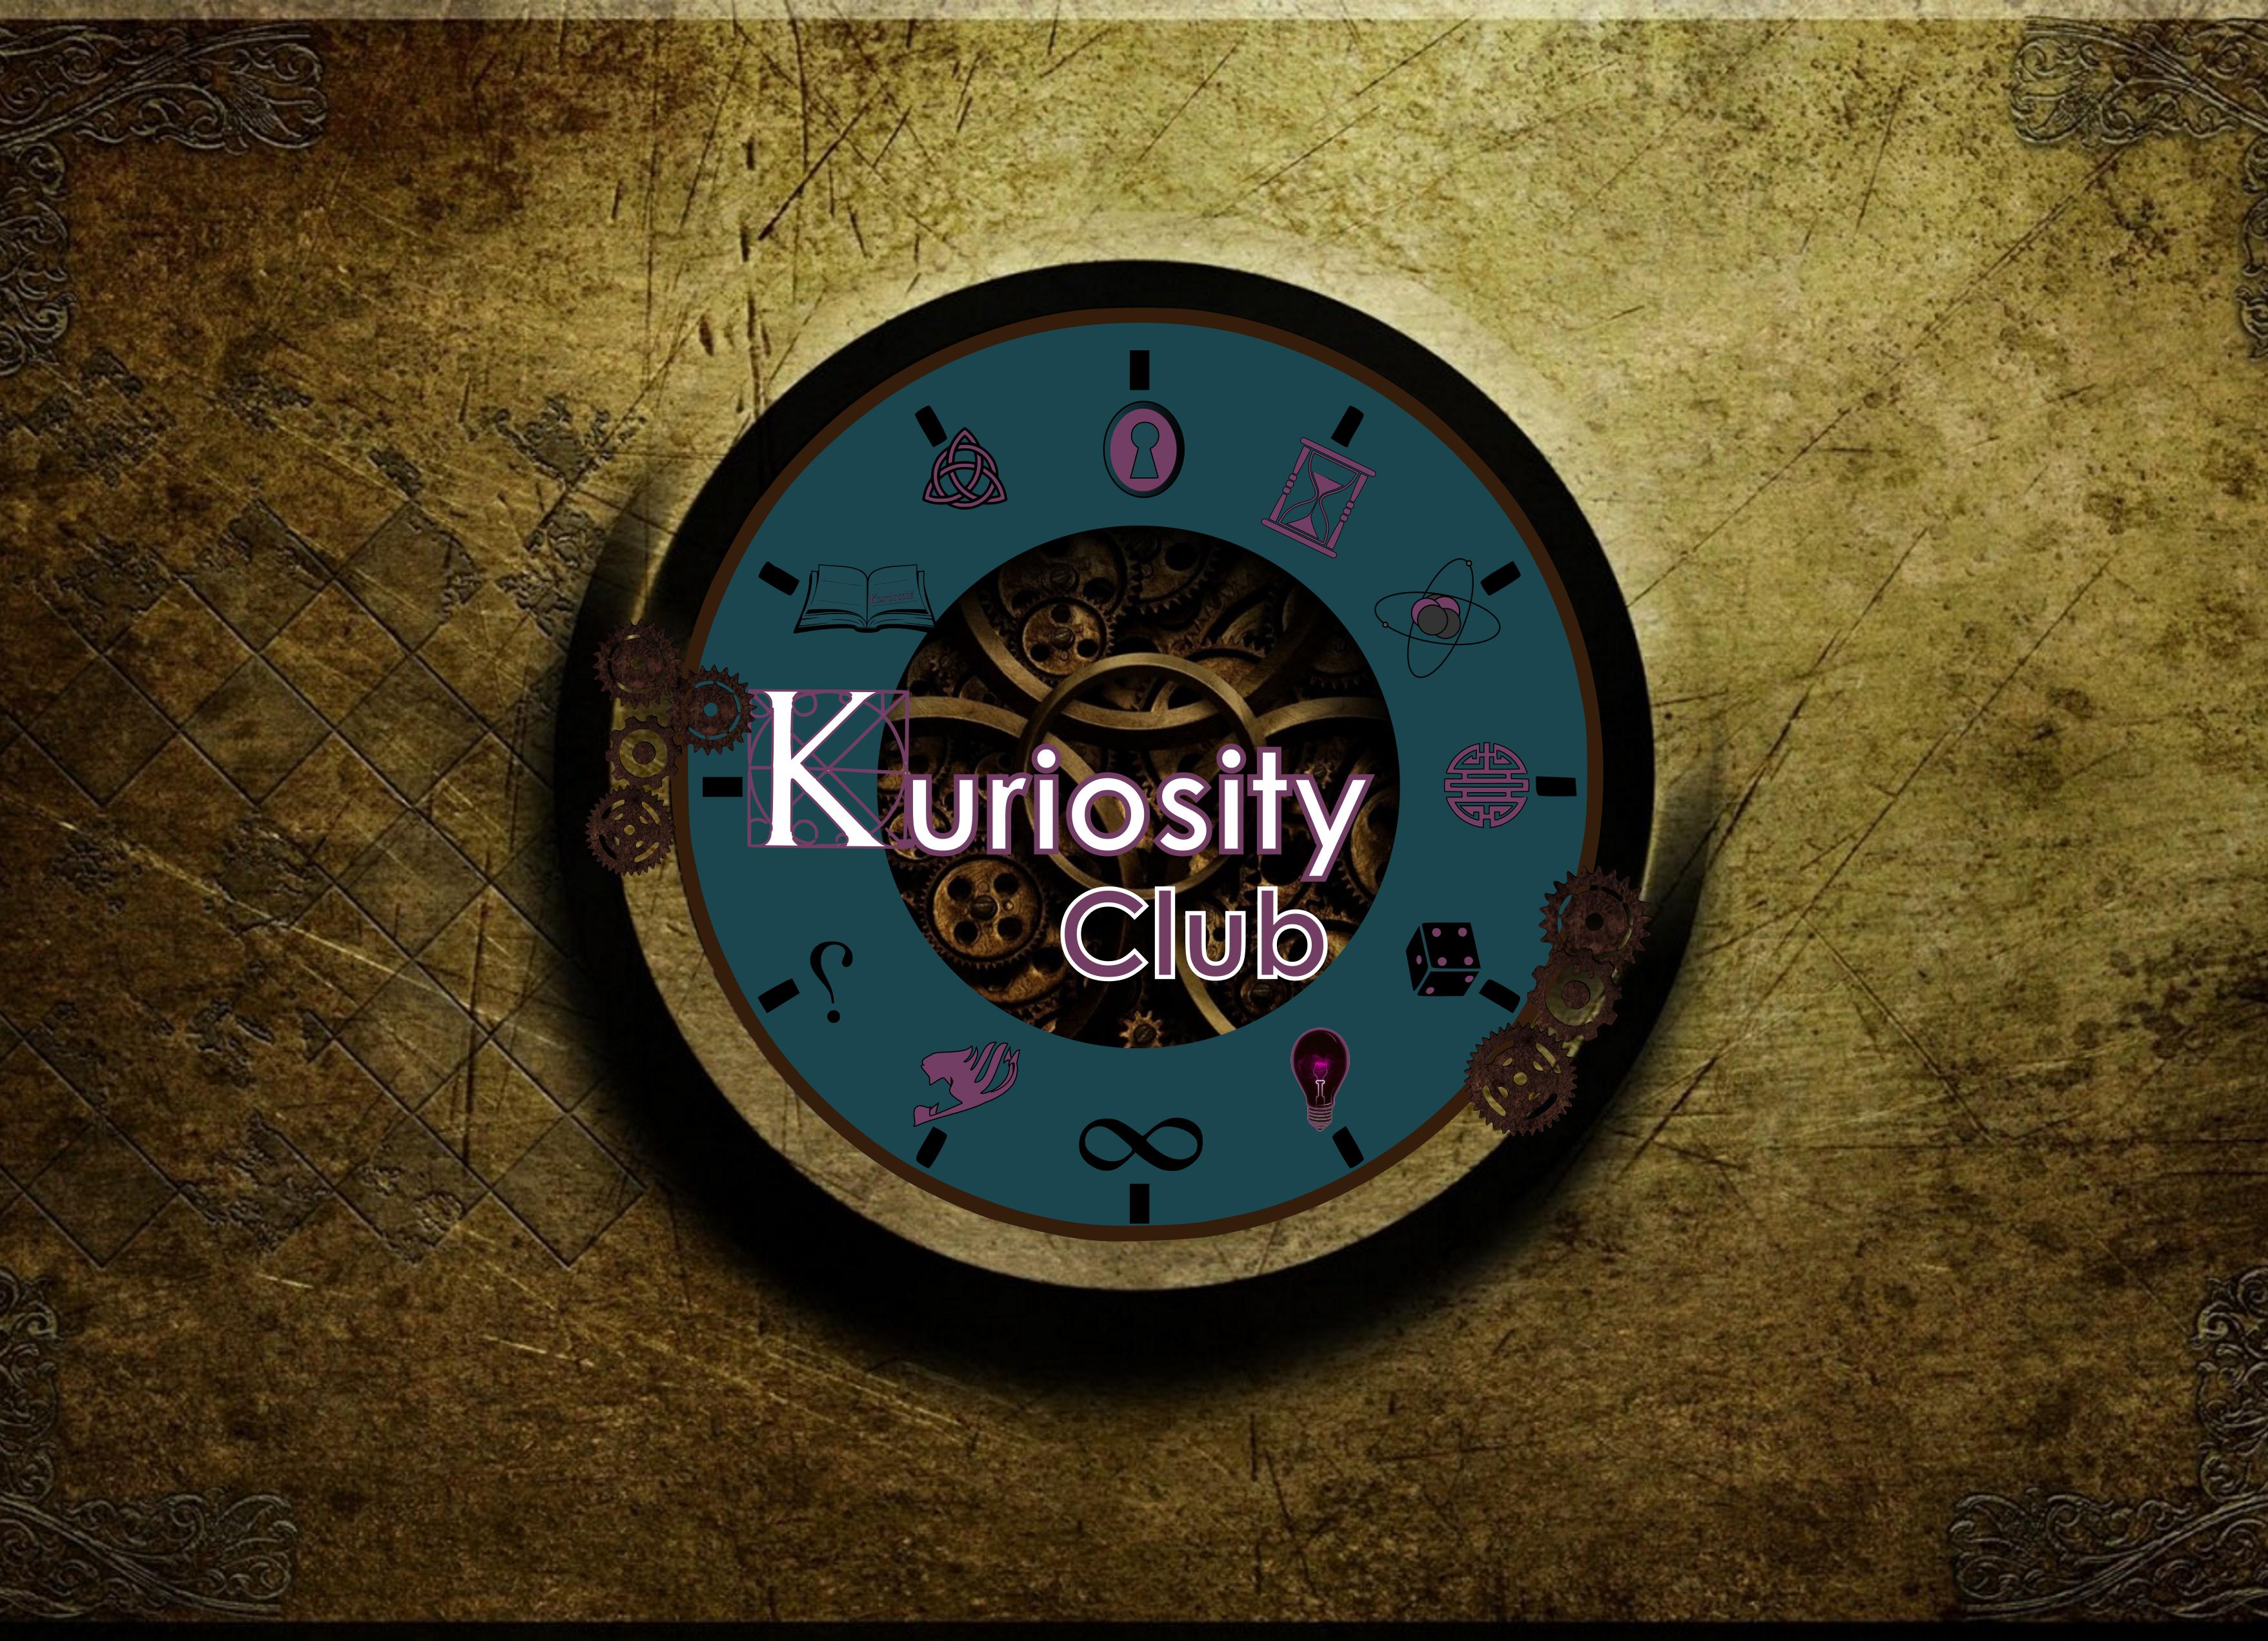 Kuriosity-Club